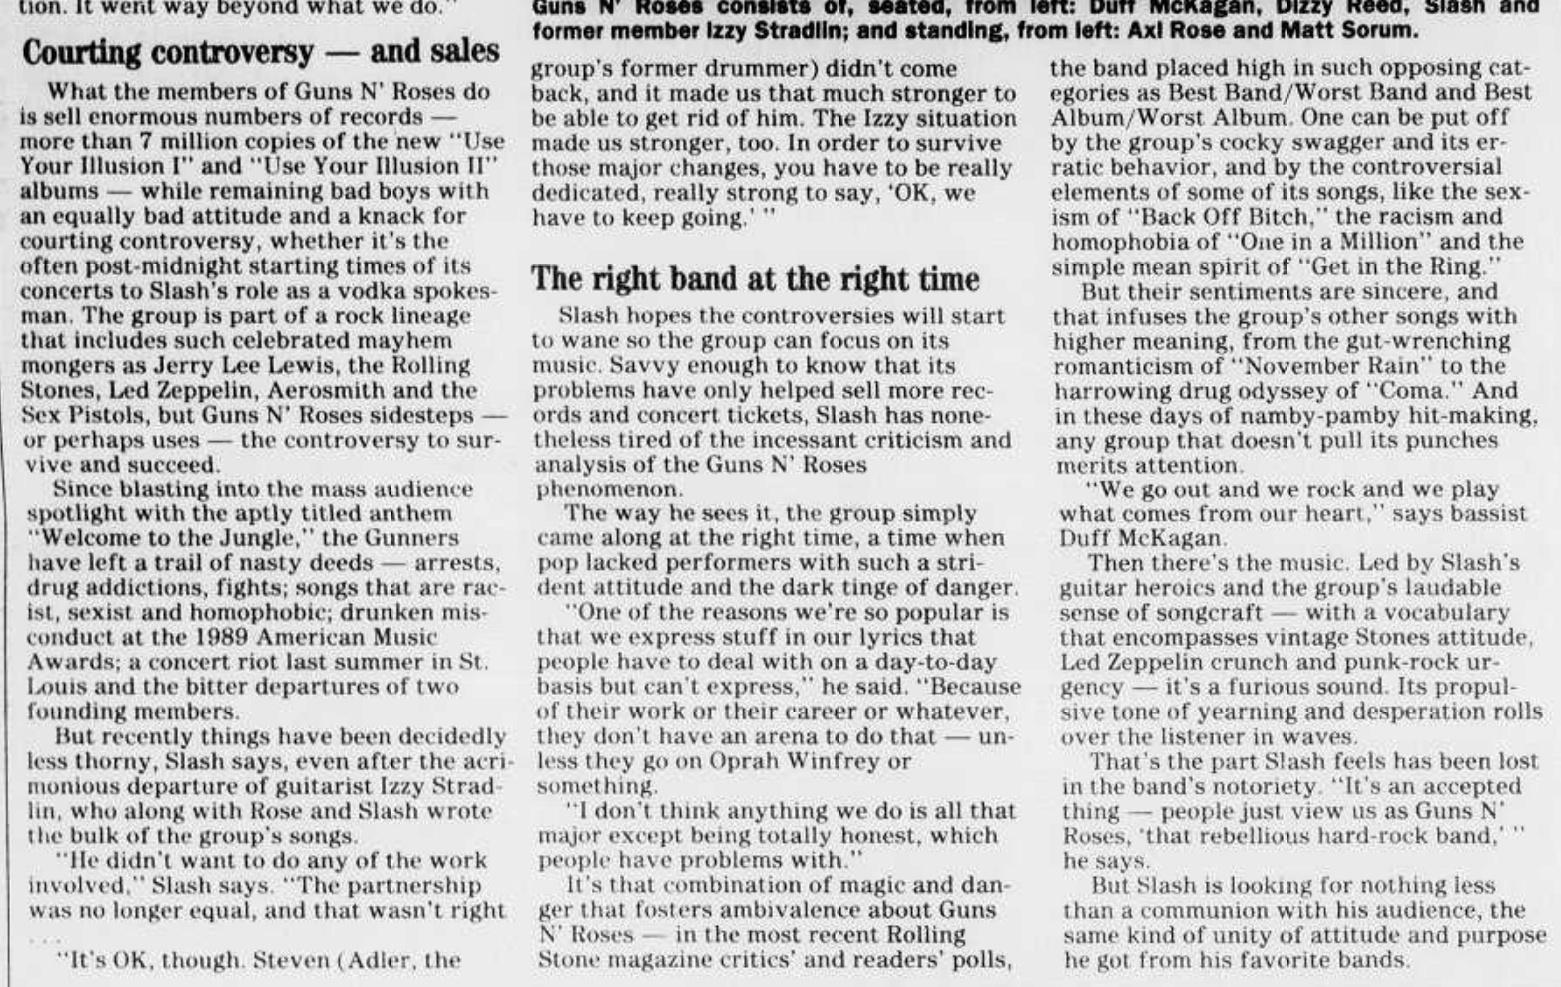 1992.04.12 - Detroit Free Press - Guns N' Roses Guitarist Cuts Right to the Heart (Slash) Colora11